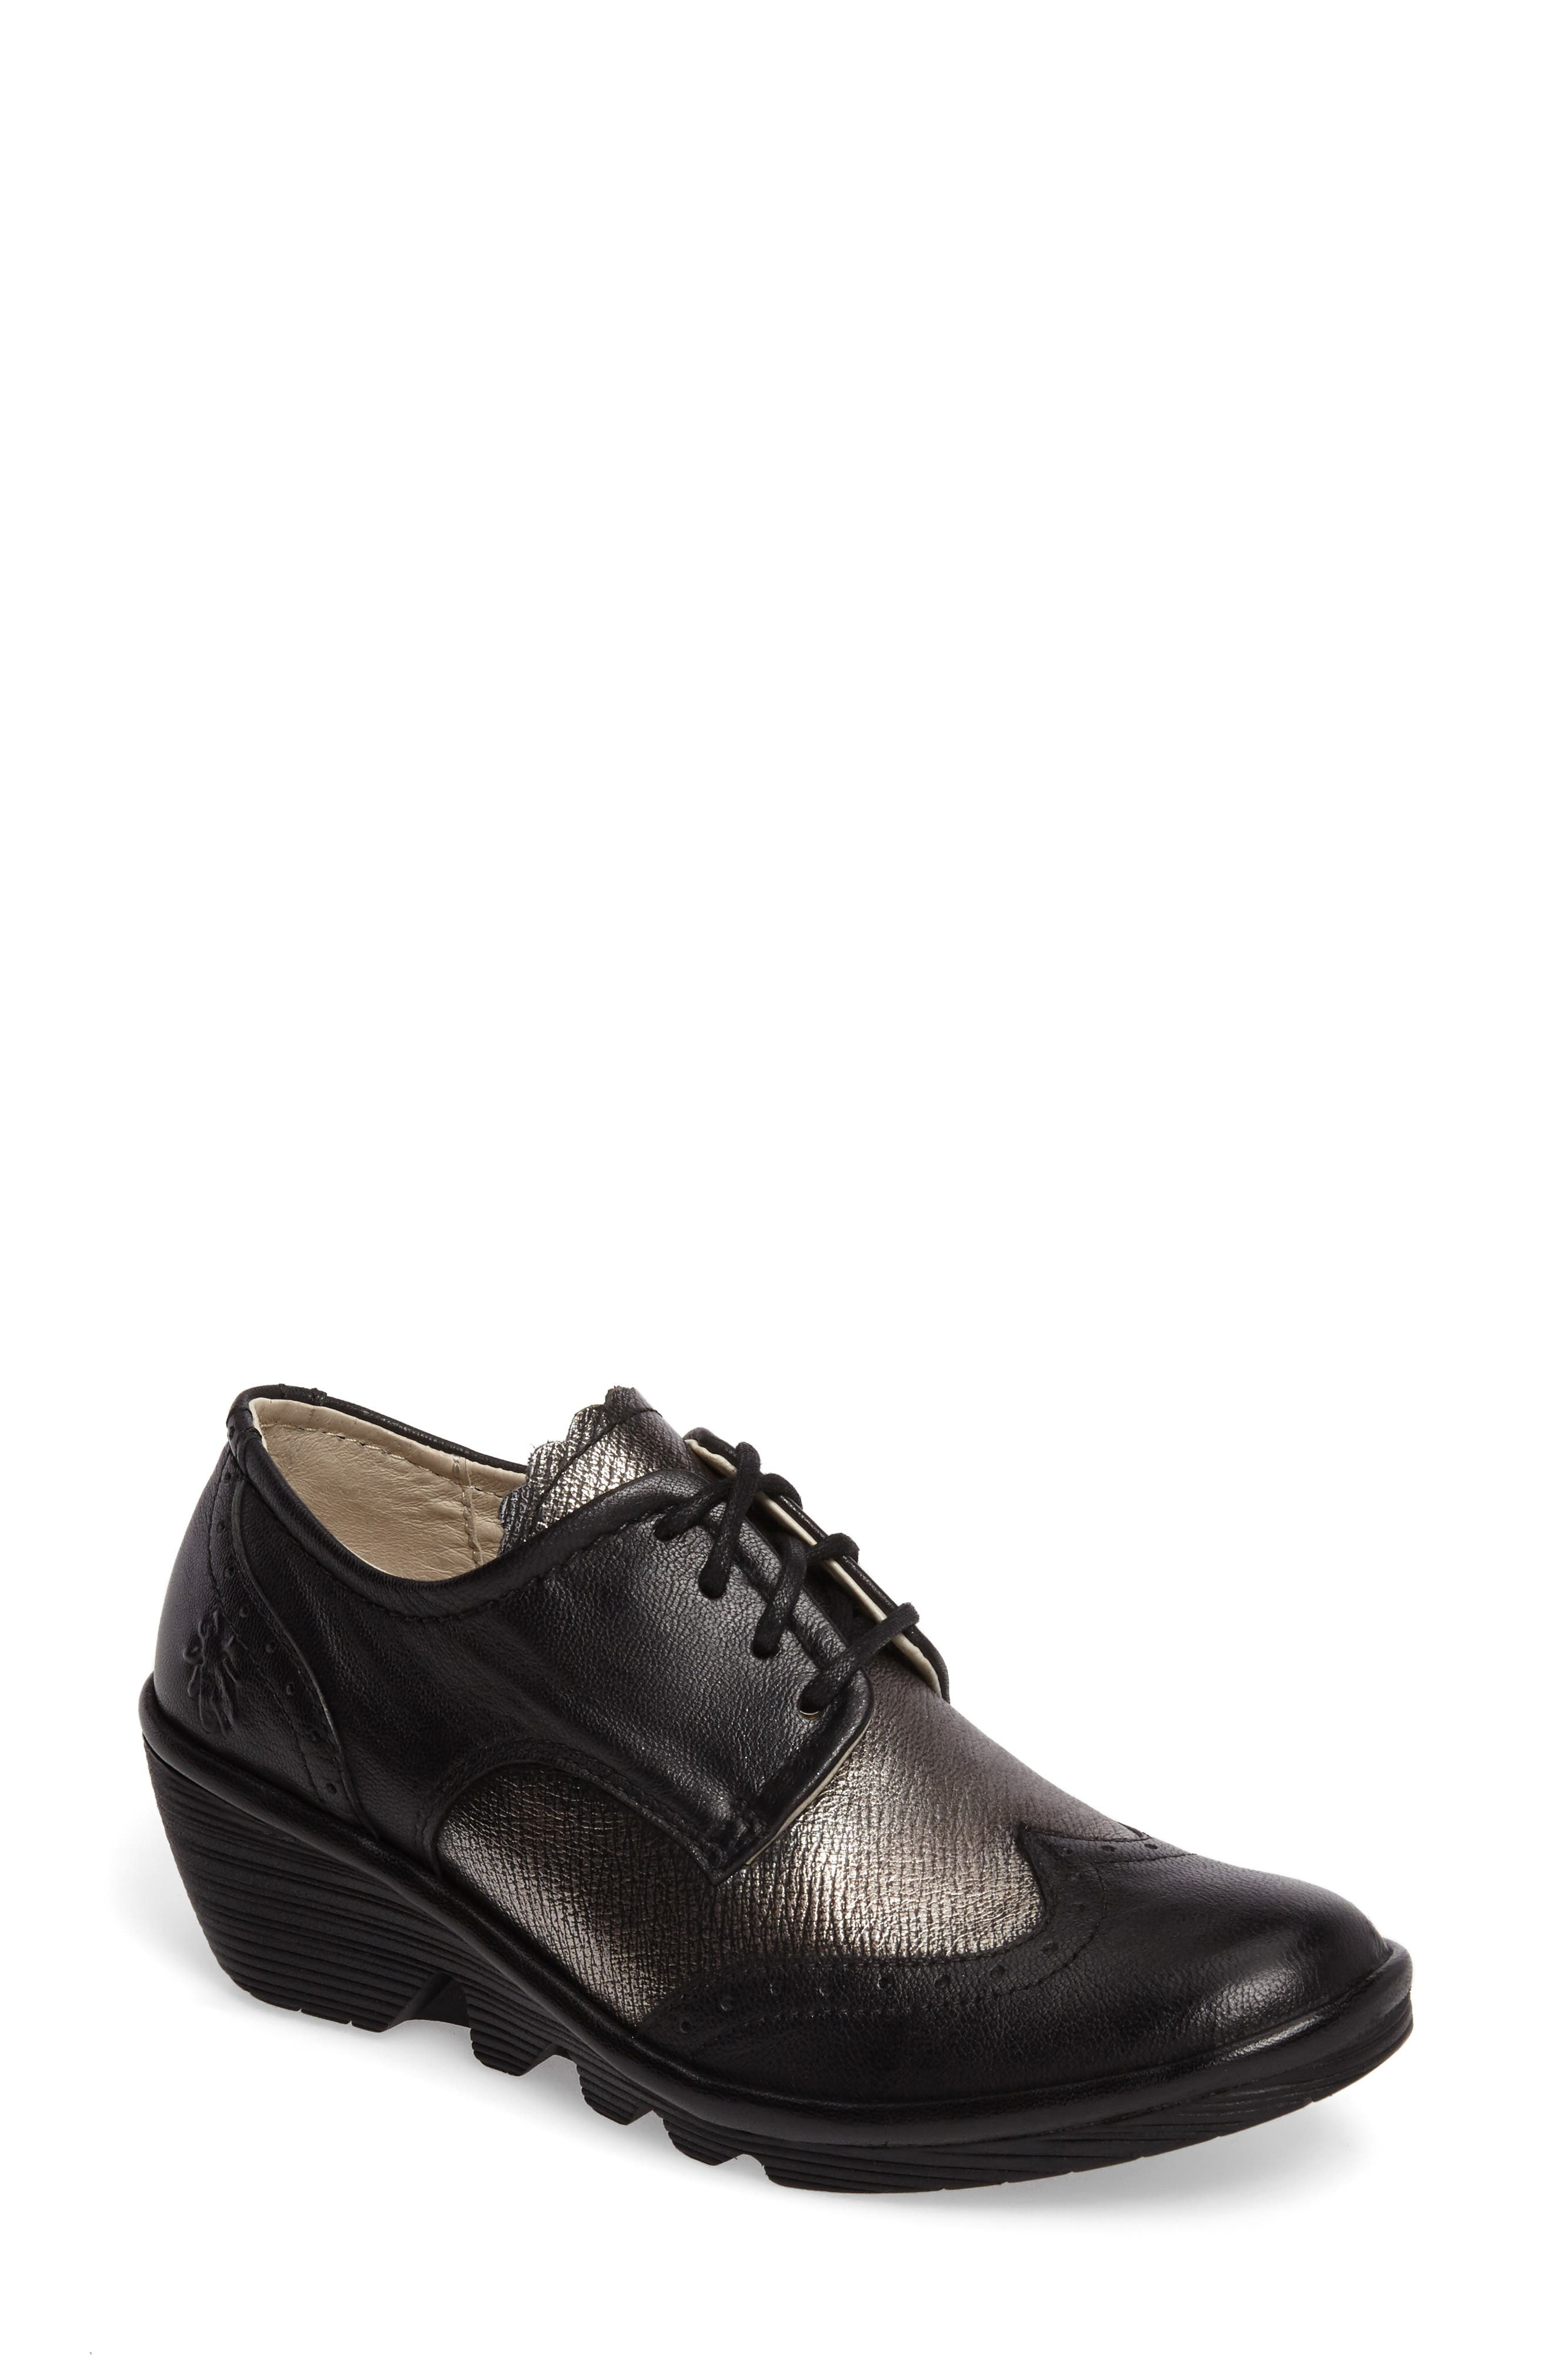 'Palt' WedgePump,                         Main,                         color, Black/ Antique Silver Leather